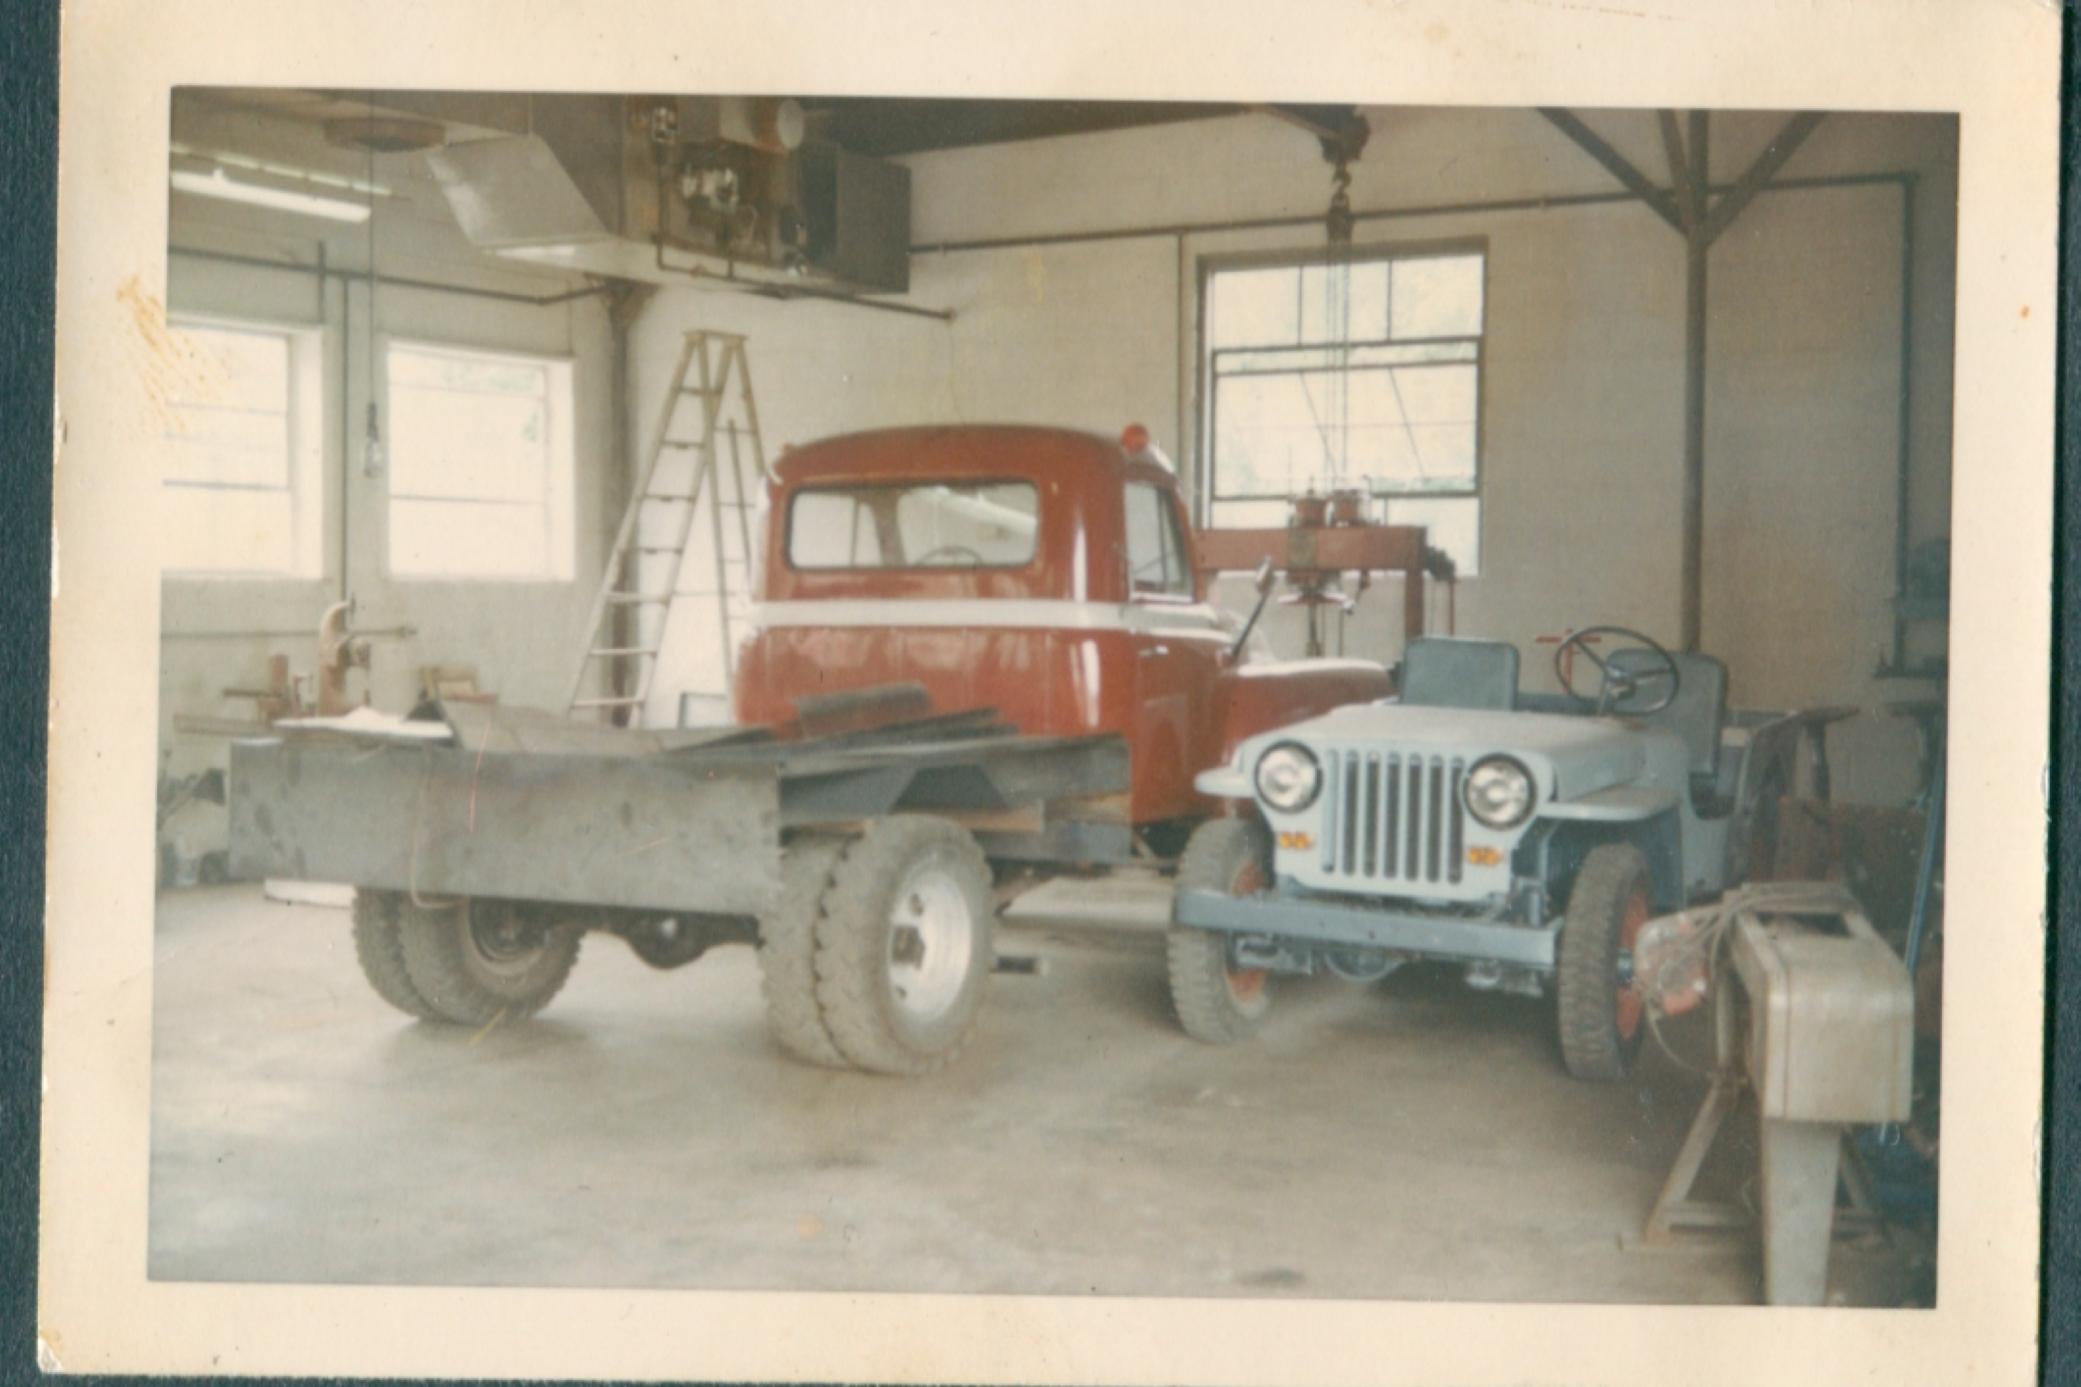 1956 international harvester tow truck 2